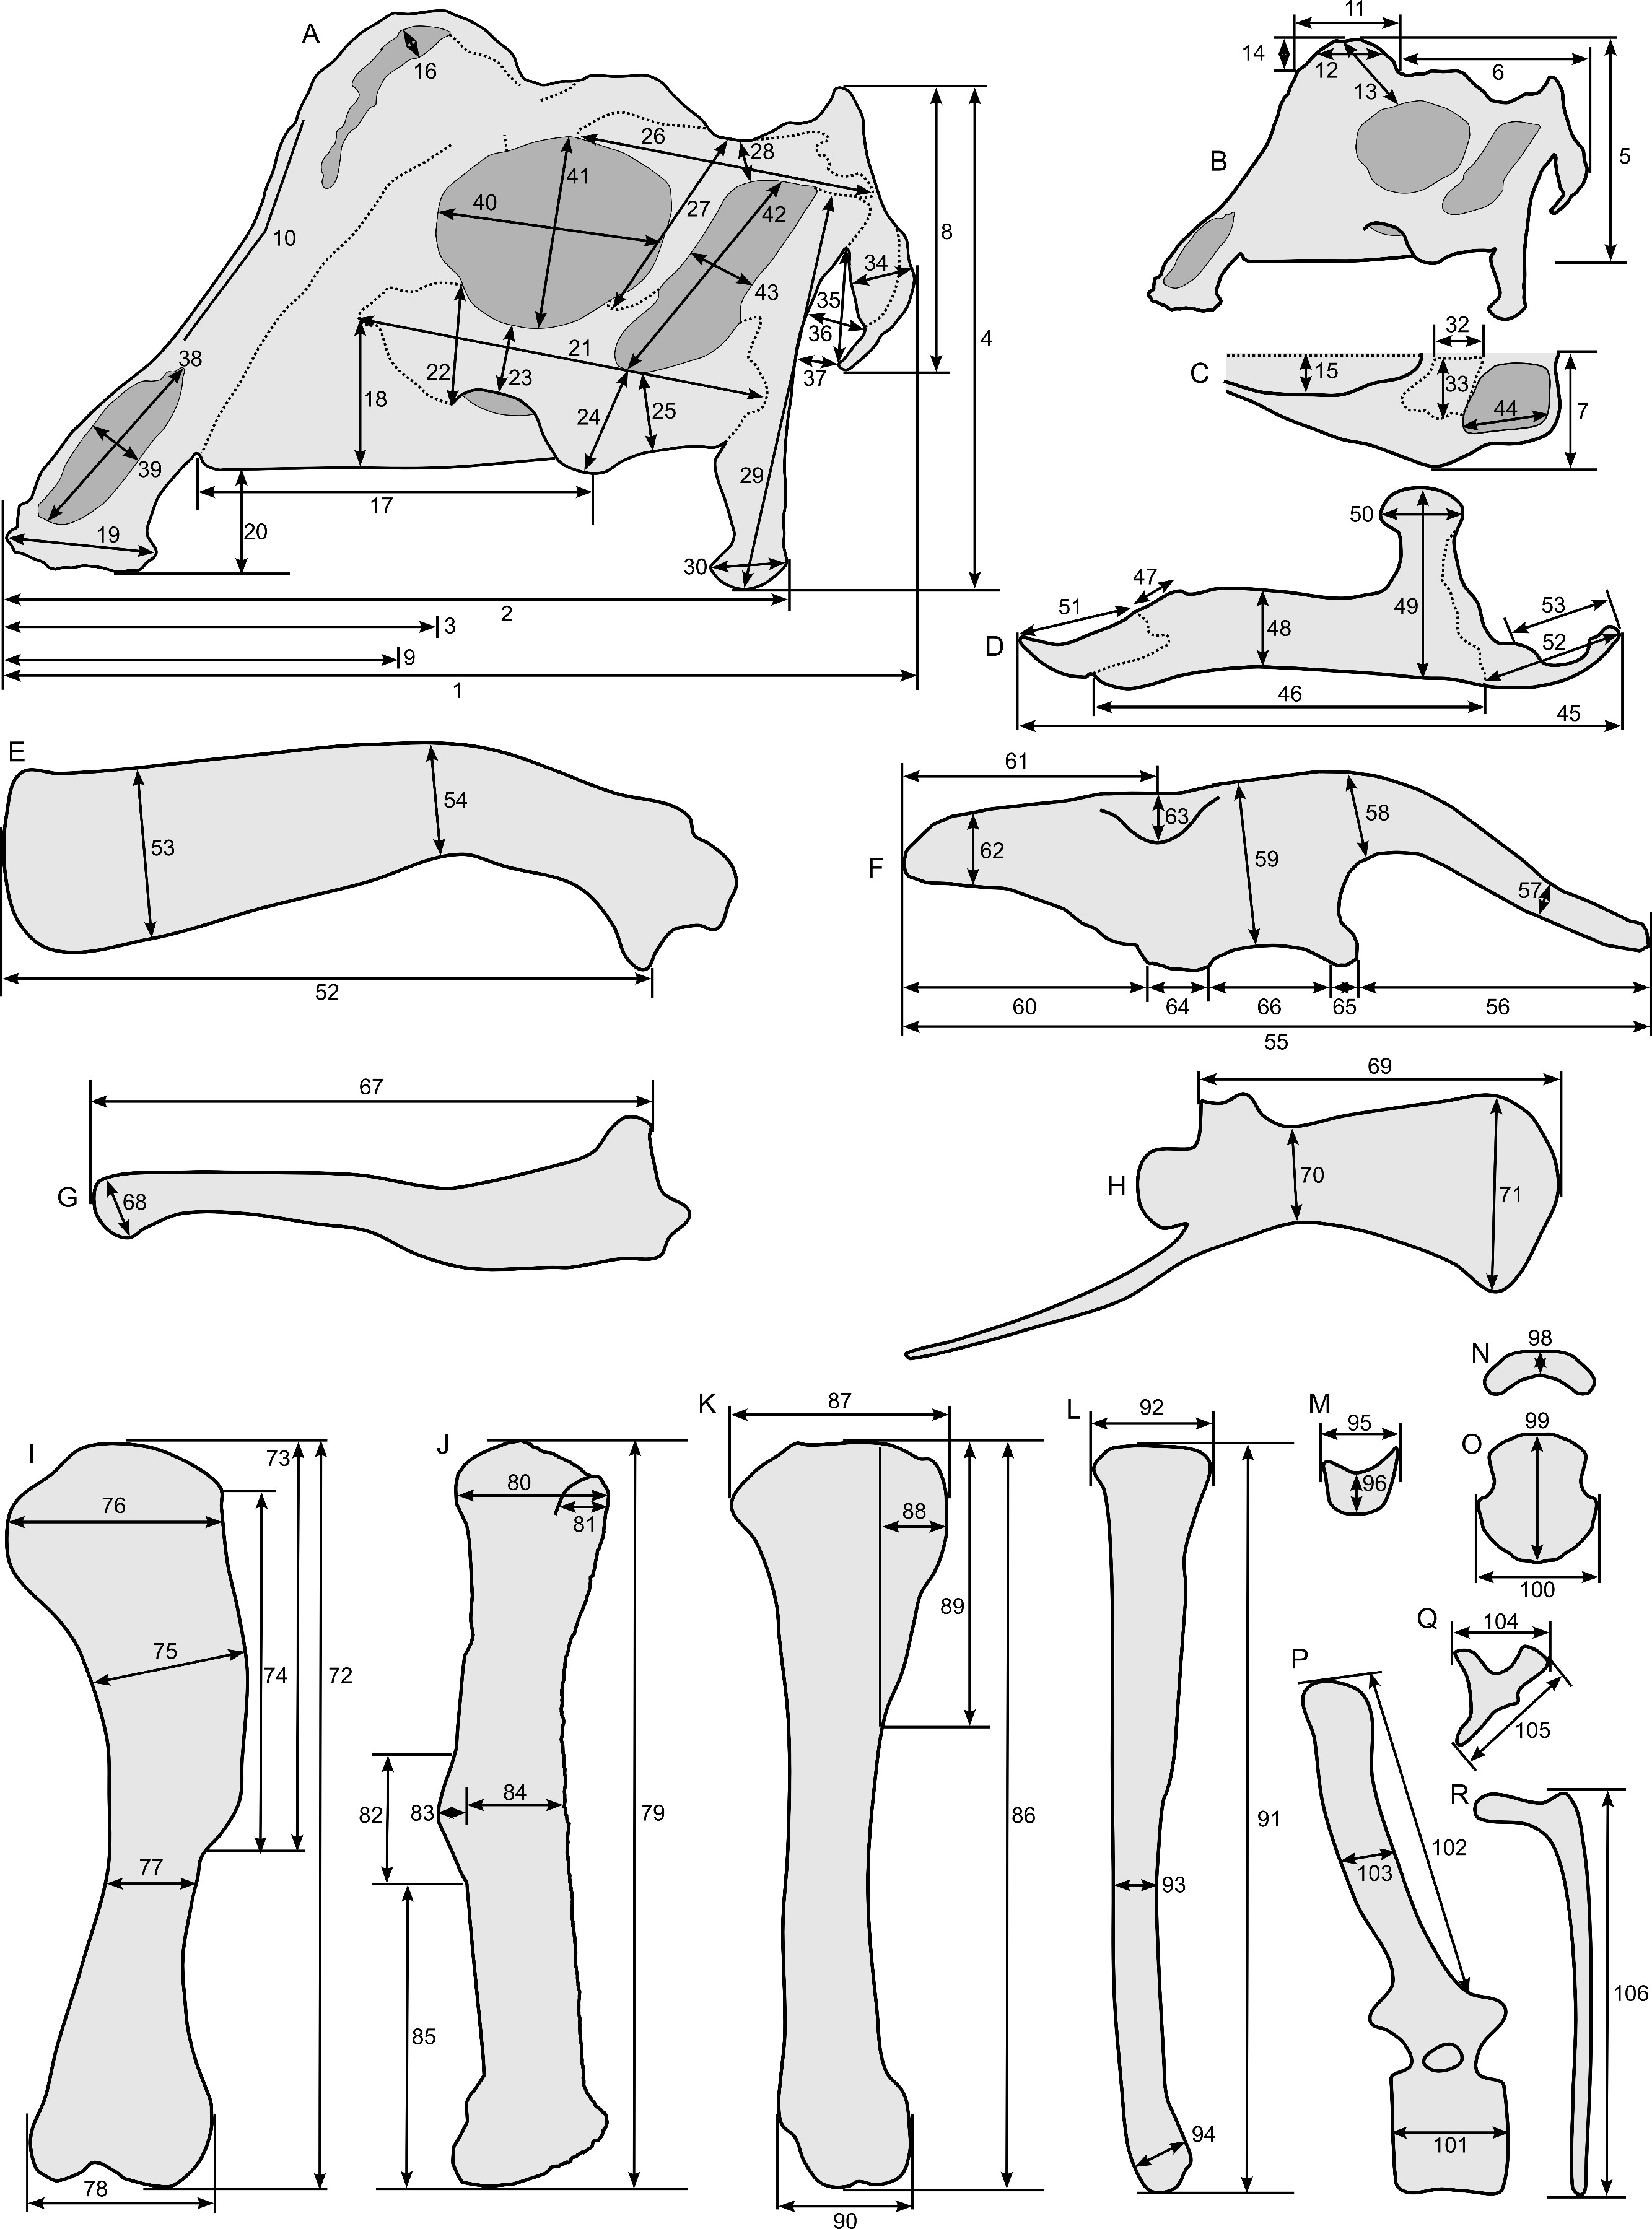 Ontogeny In The Tube Crested Dinosaur Parasaurolophus Hadrosauridae Reassembled Number 5 Is Alive Again Cru Jones Society Doi 107717 Peerj182 Fig